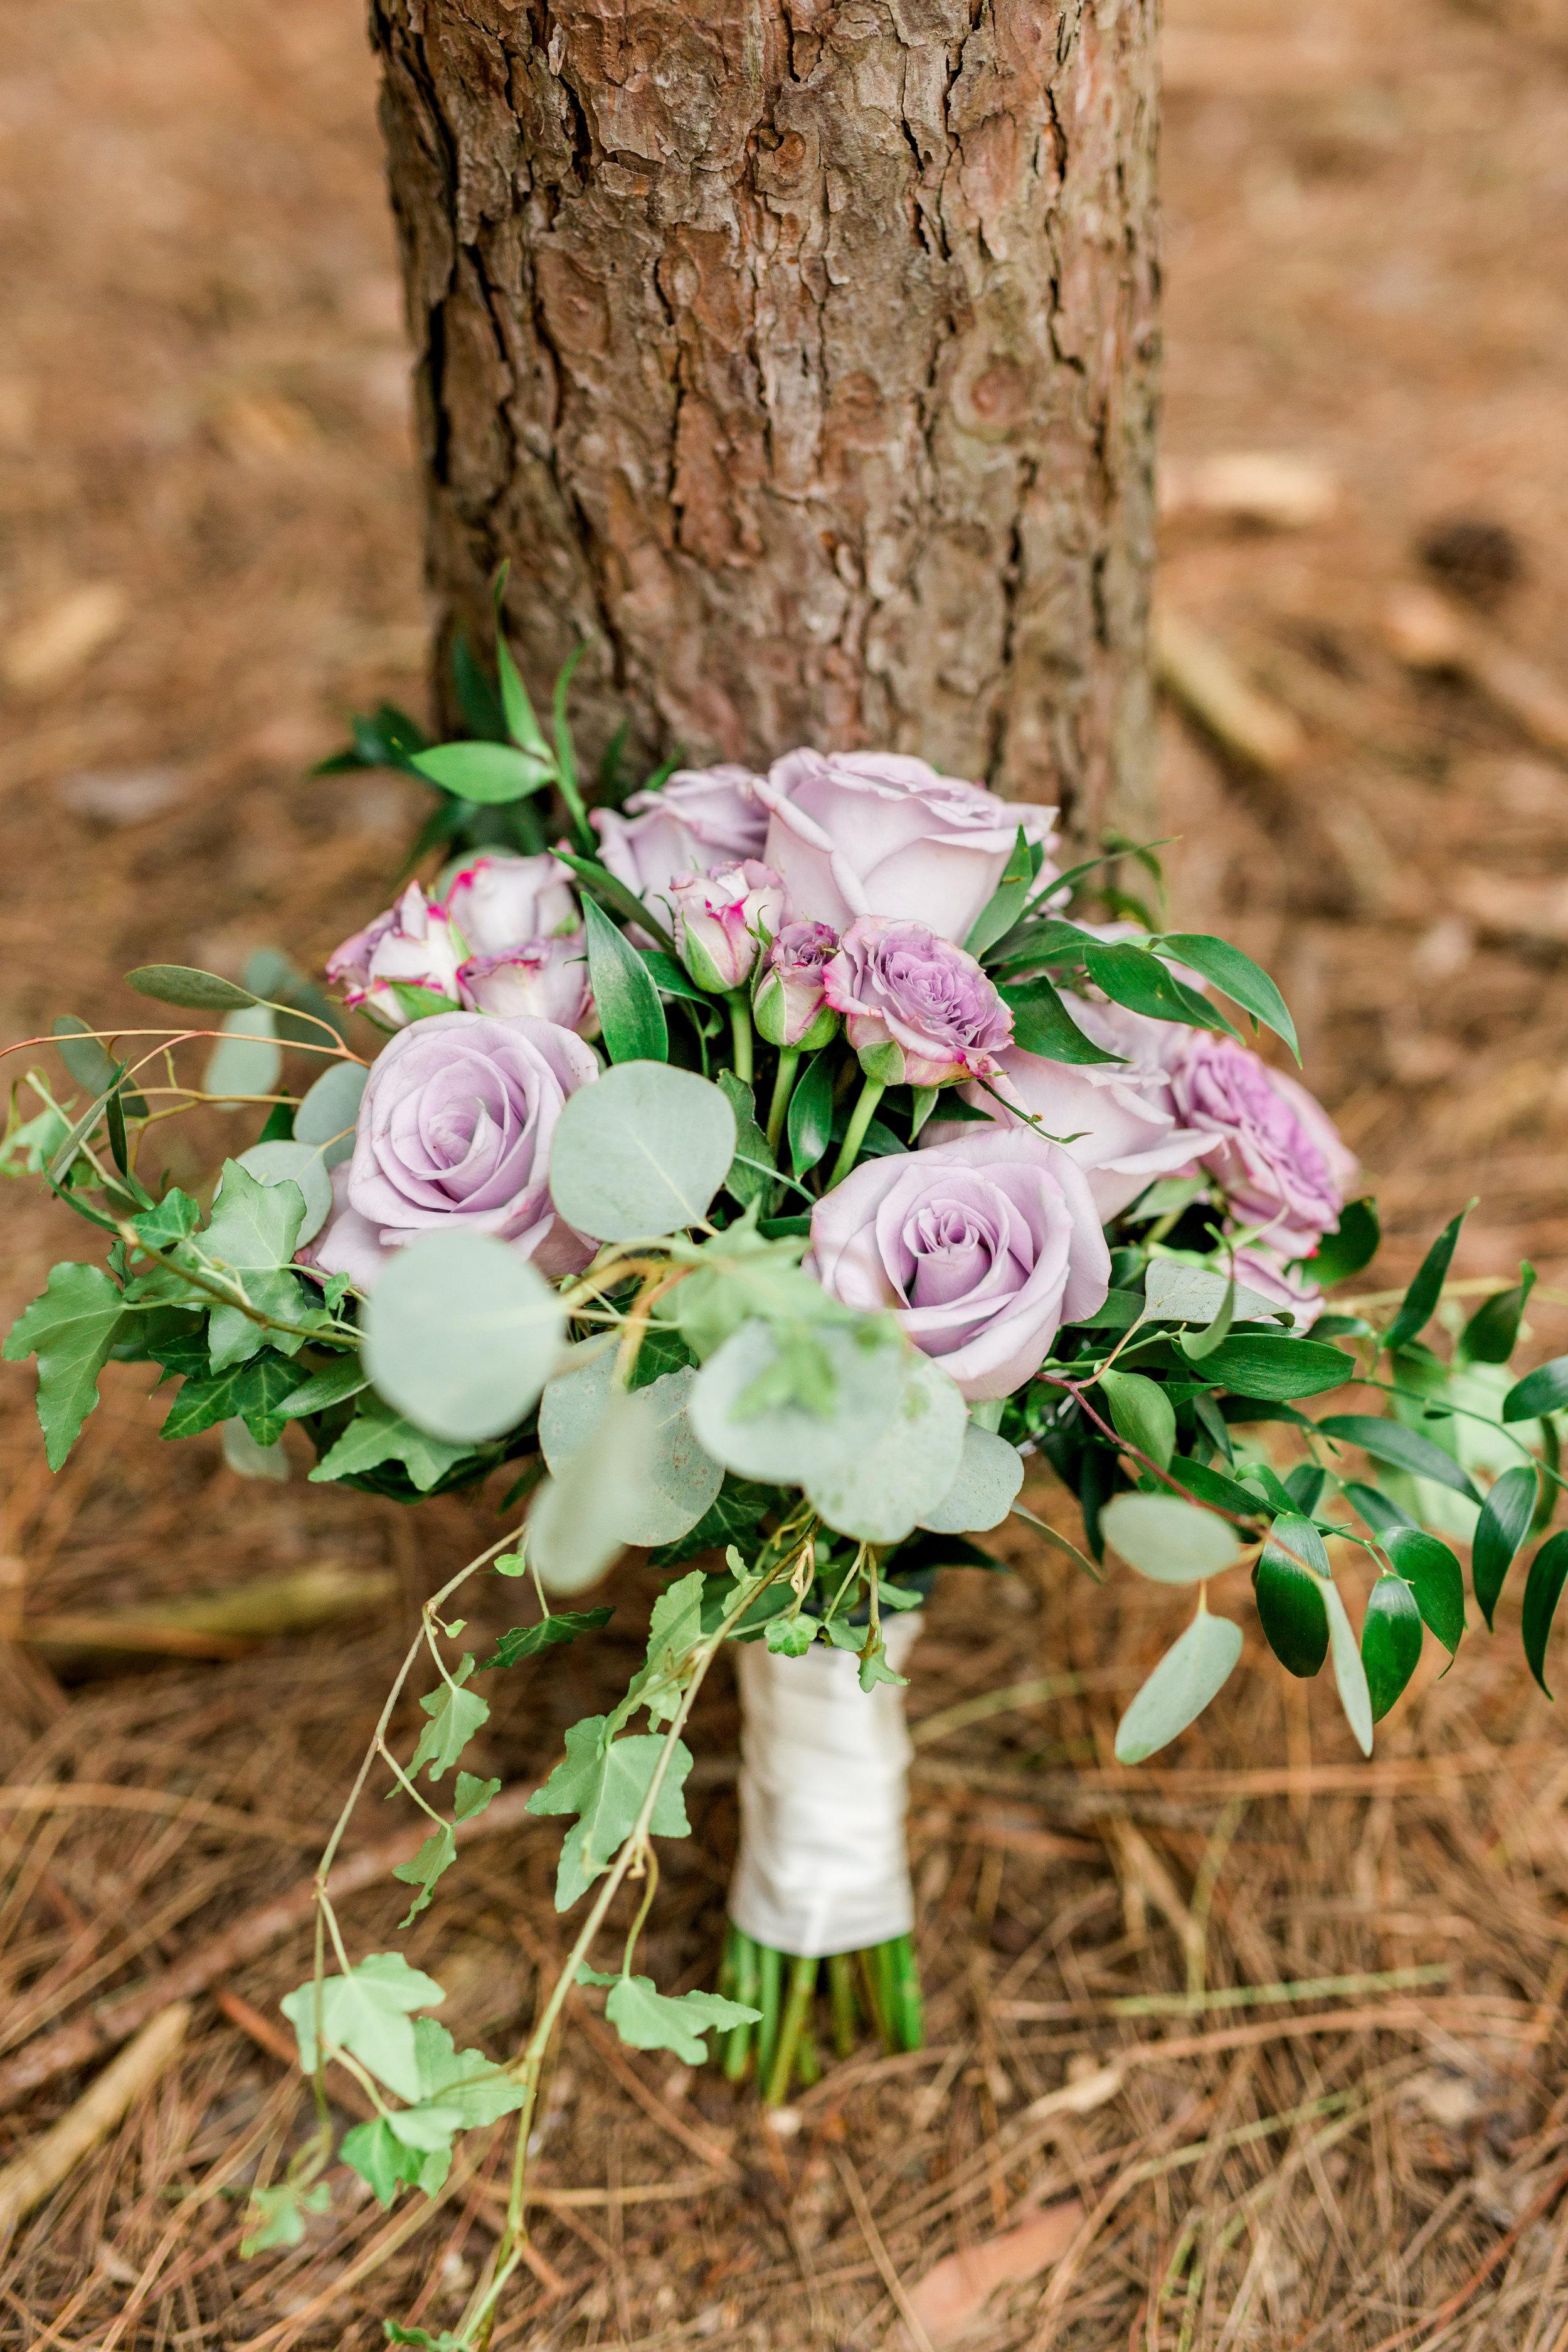 Danielle-Giroux-Amir-Golbazi-Toronto-Wedding-Photographer-Bellvue-Manor_DeLuca_1-805.jpg